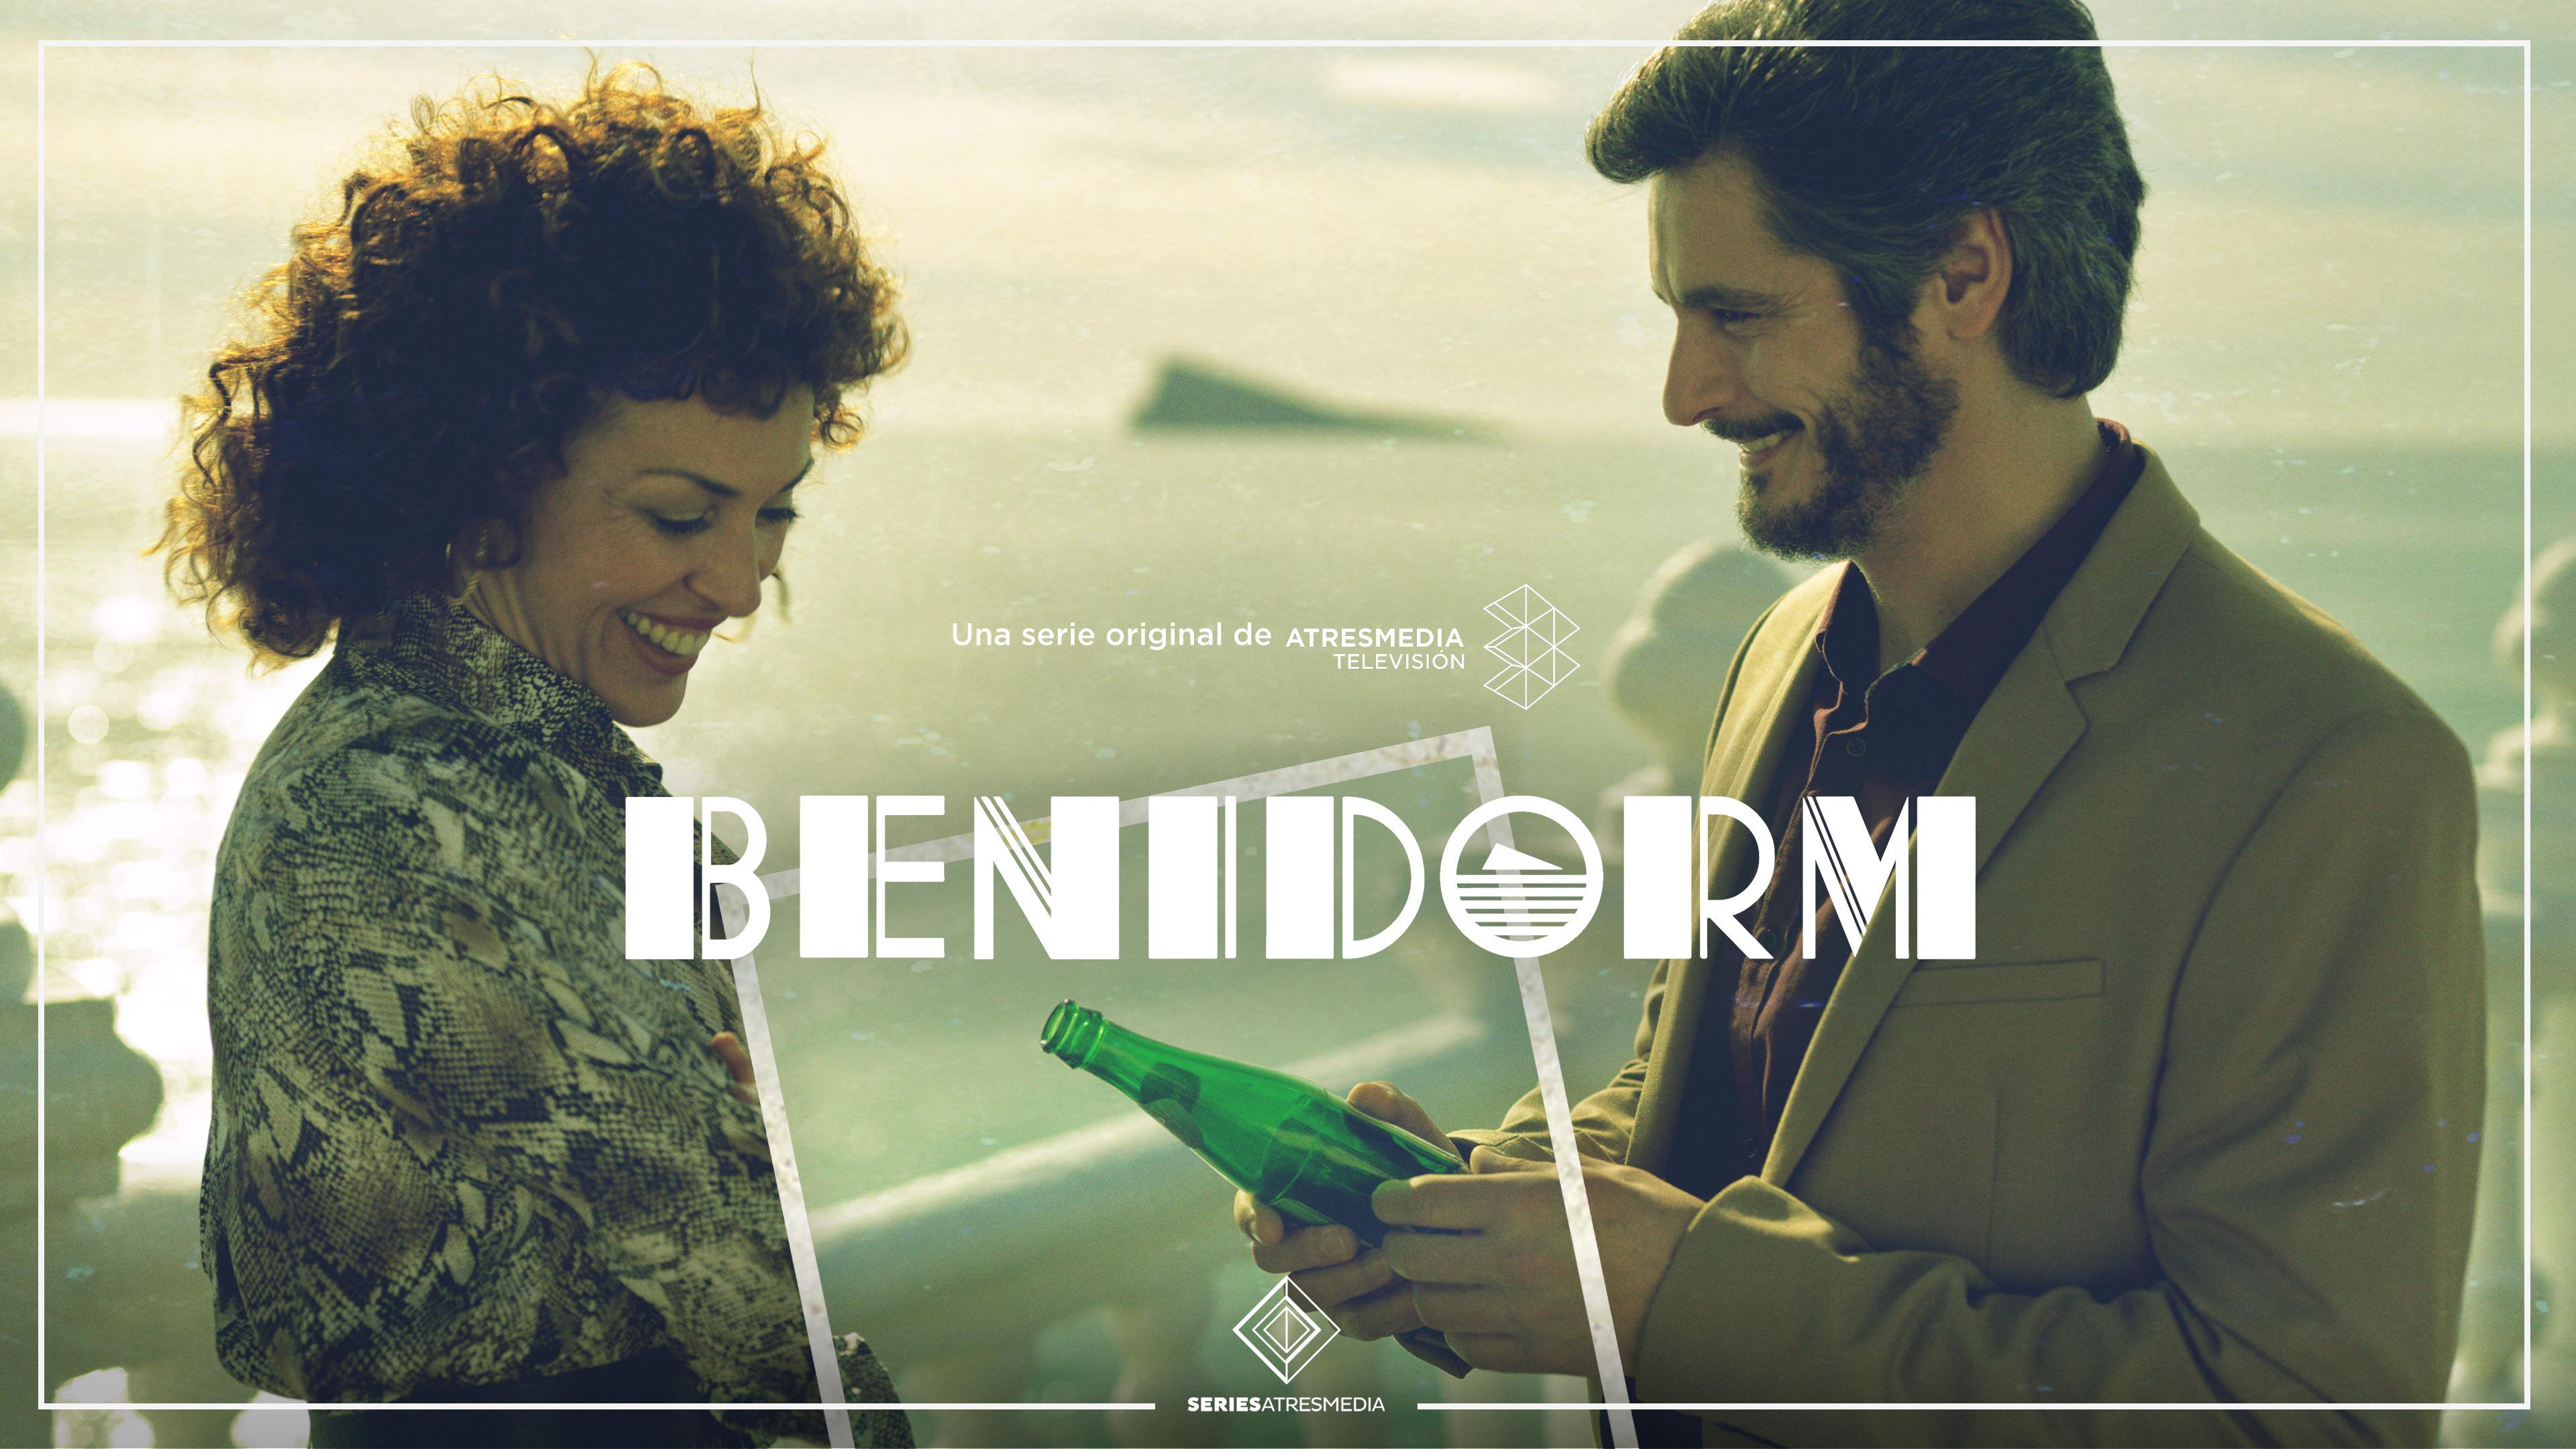 Benidorm (A3Media series)